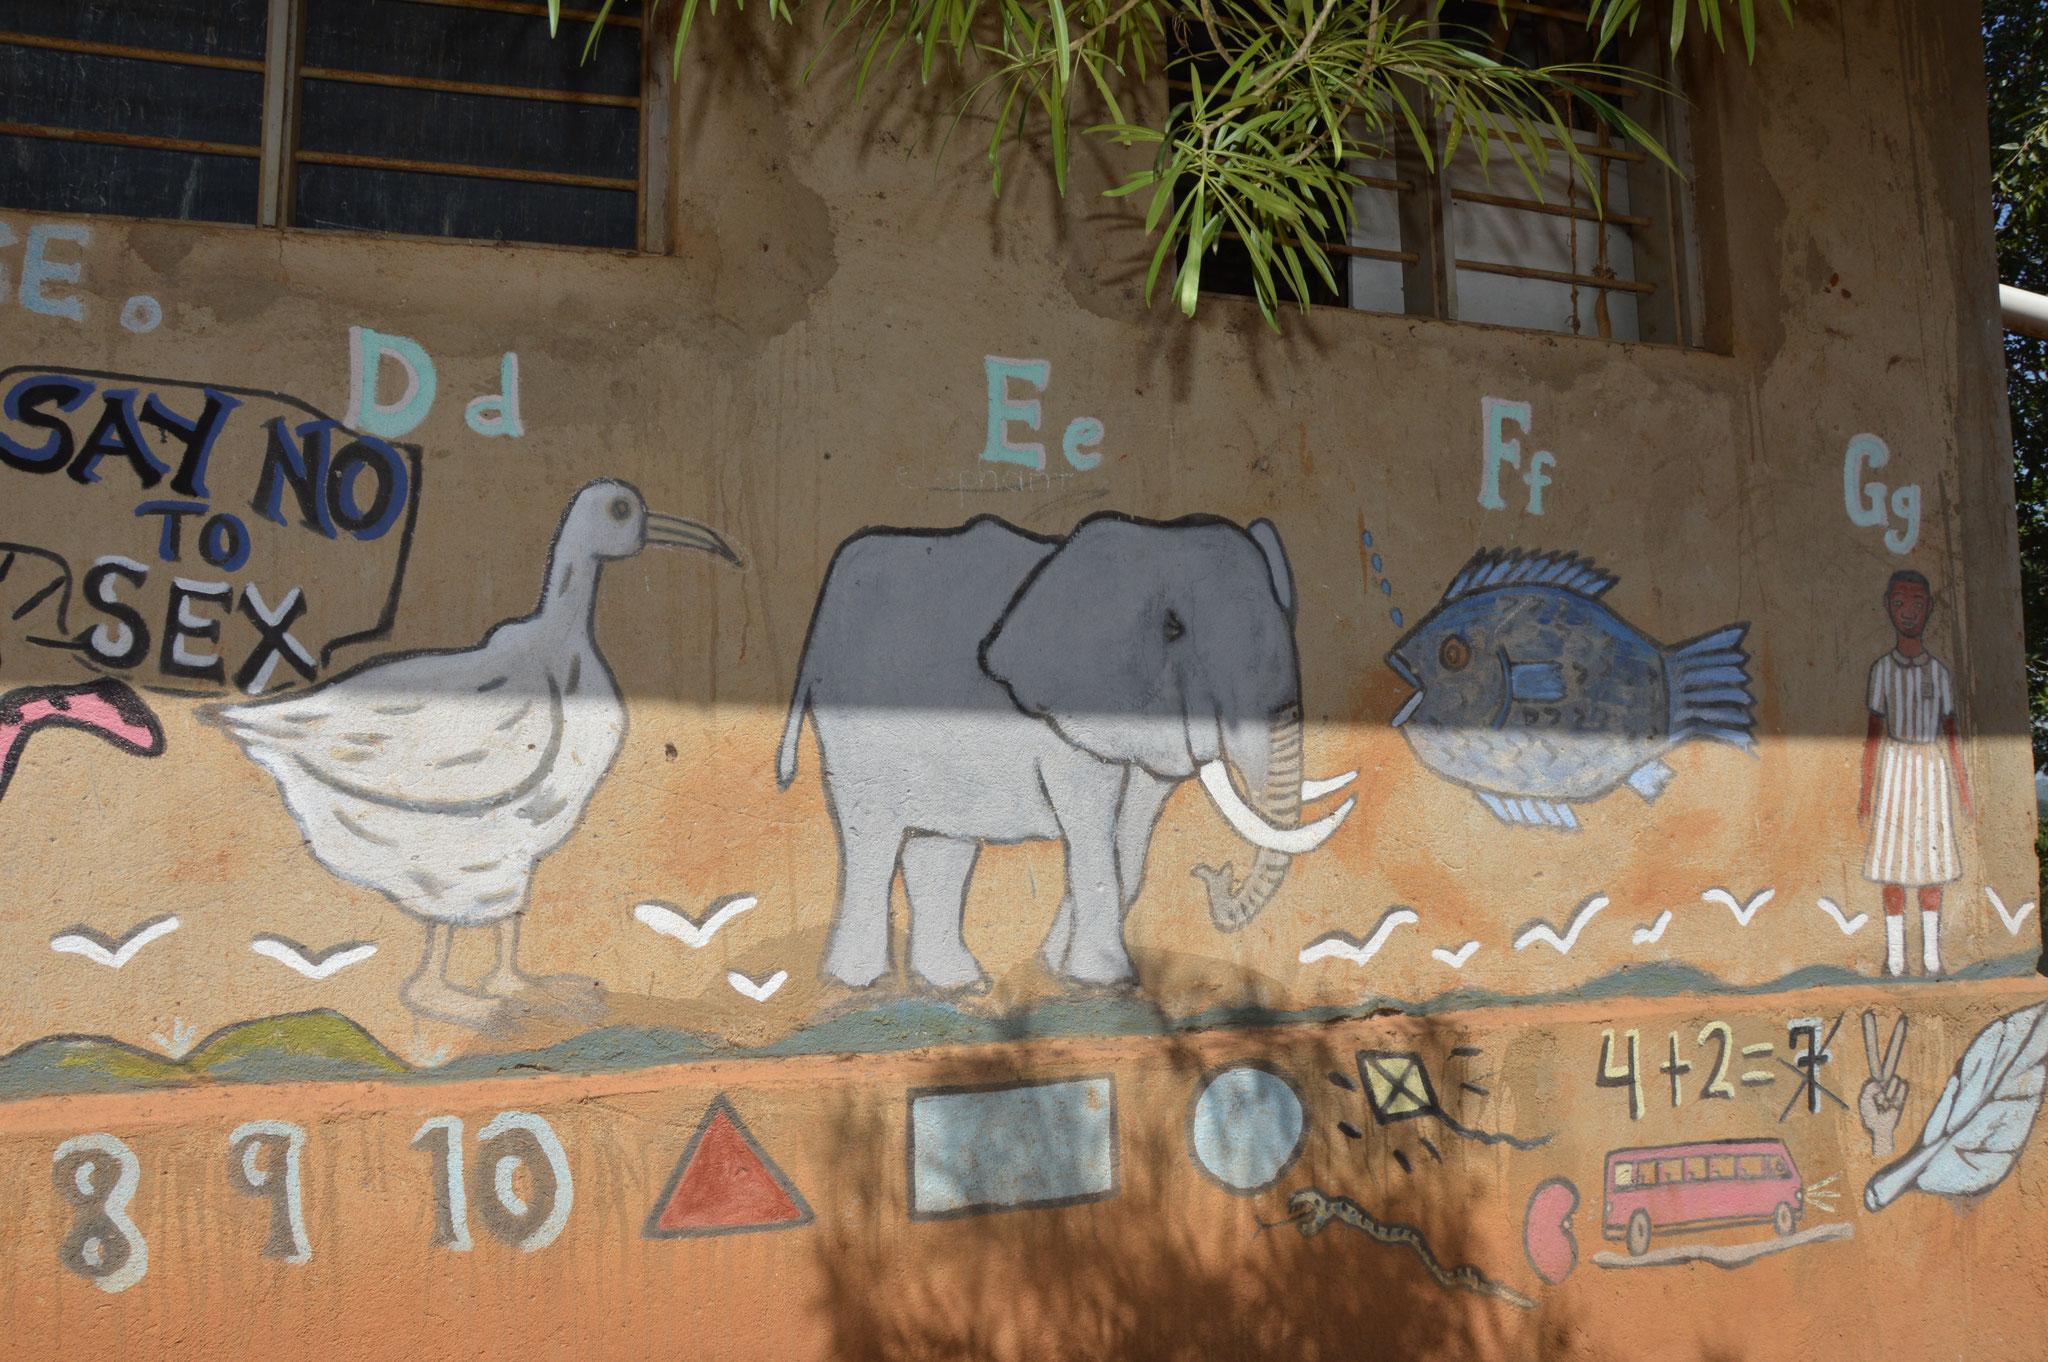 Sag nein zu Sex / D=Duck (Ente); E= Elefant; F=Fish; G=Girl (Mädchen)